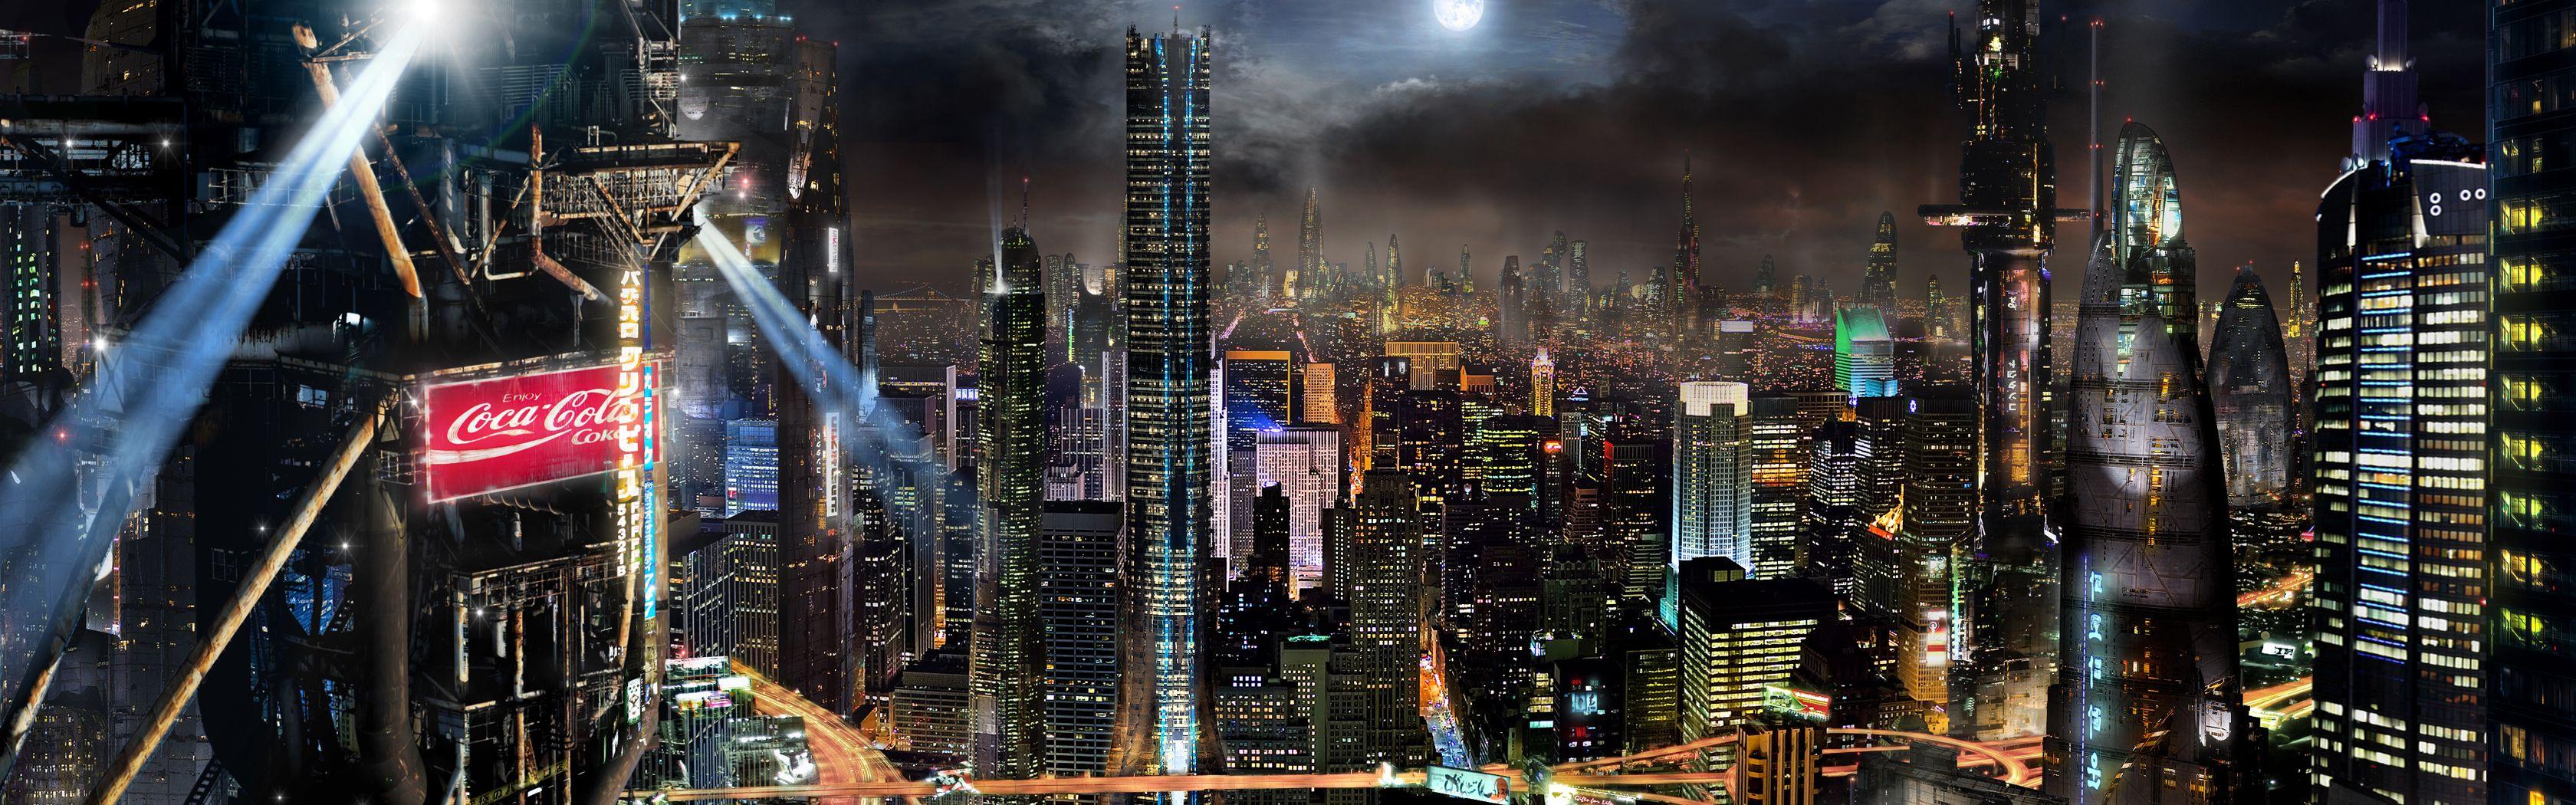 Actmm Matte 5 Dual Desktop By Rich35211 On Deviantart Full Hd Wallpaper Futuristic City Fantasy Landscape